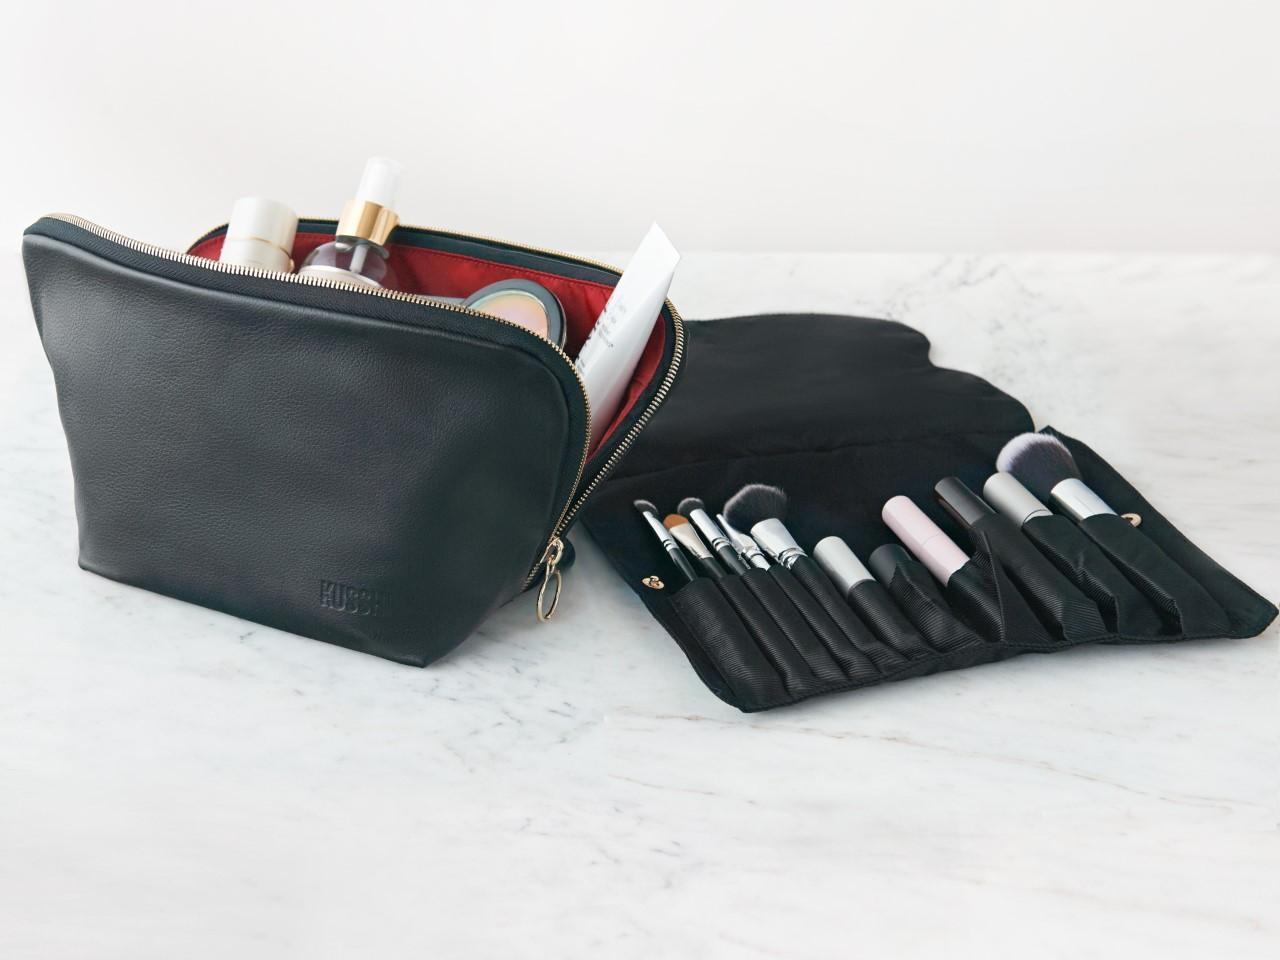 Kusshi-makeup-bag-shop-small-saturday-promo